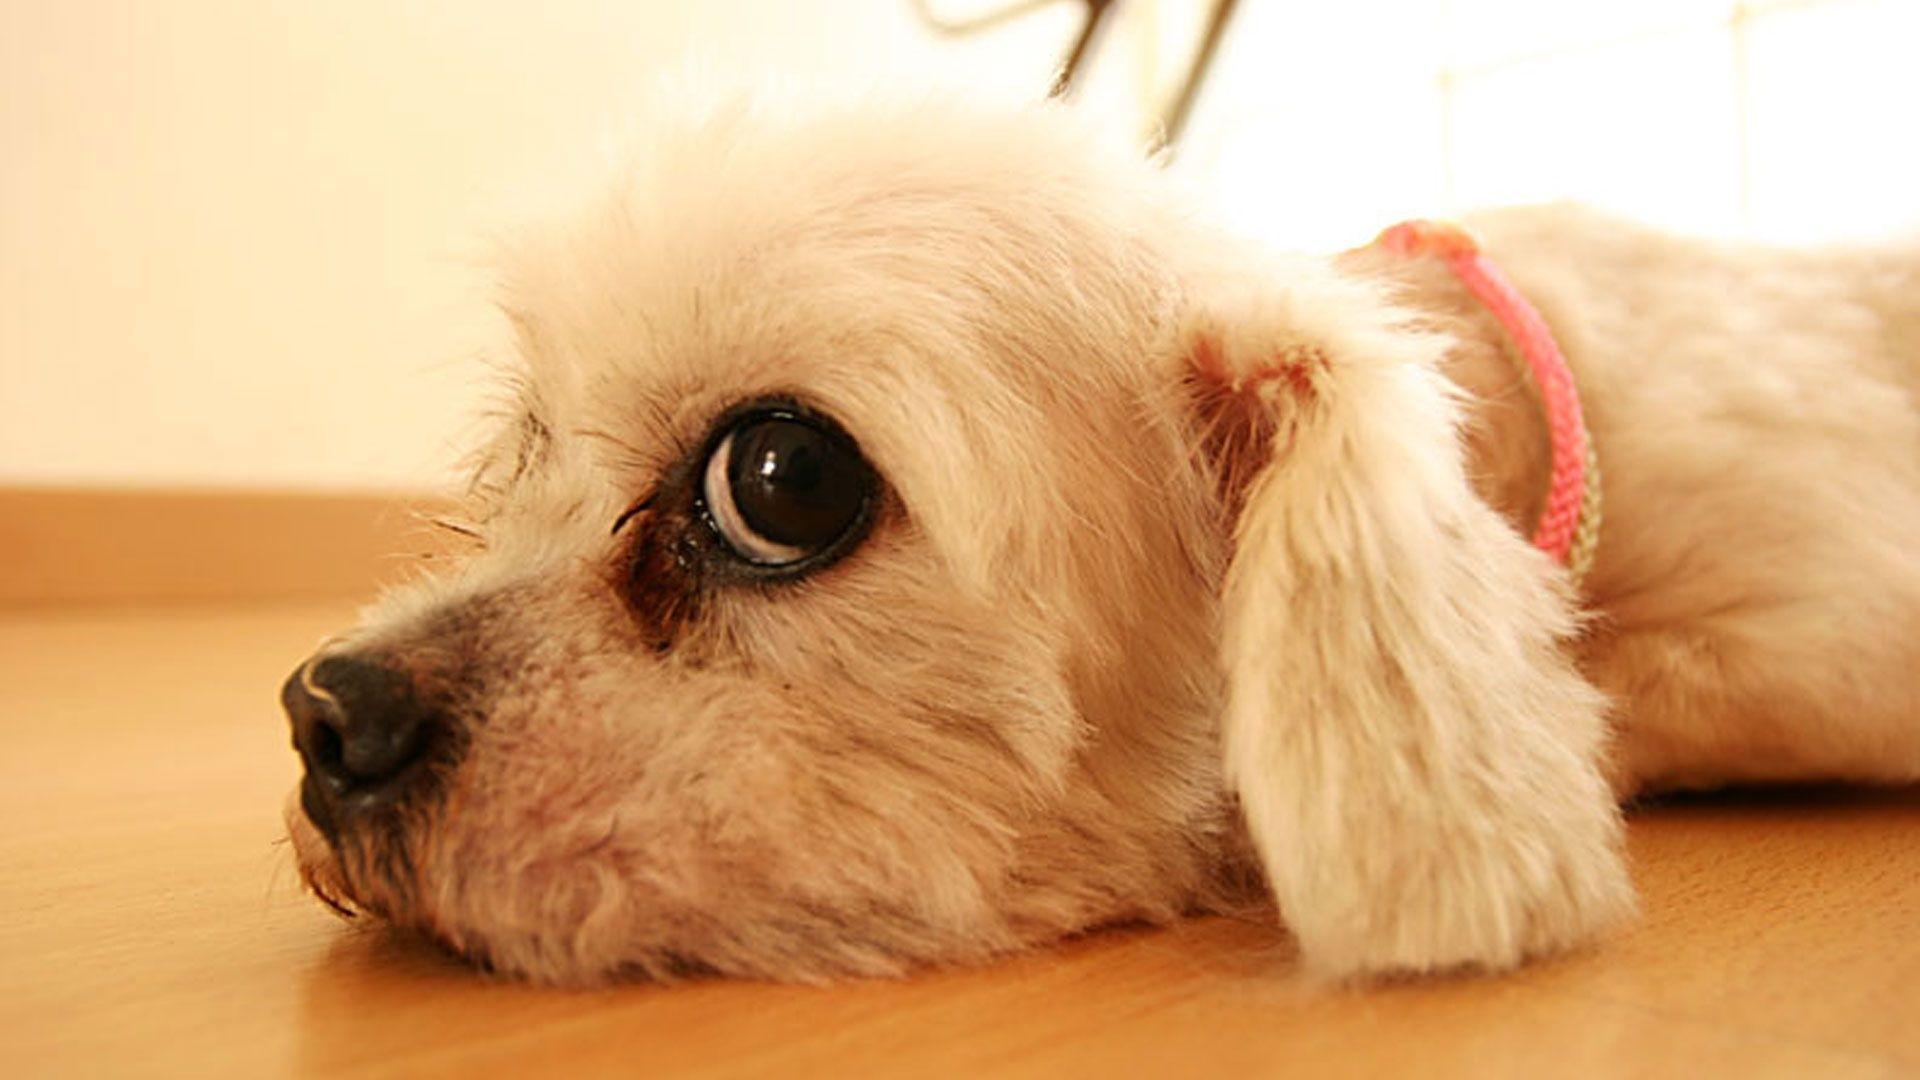 cute anime dog wallpaper - photo #35